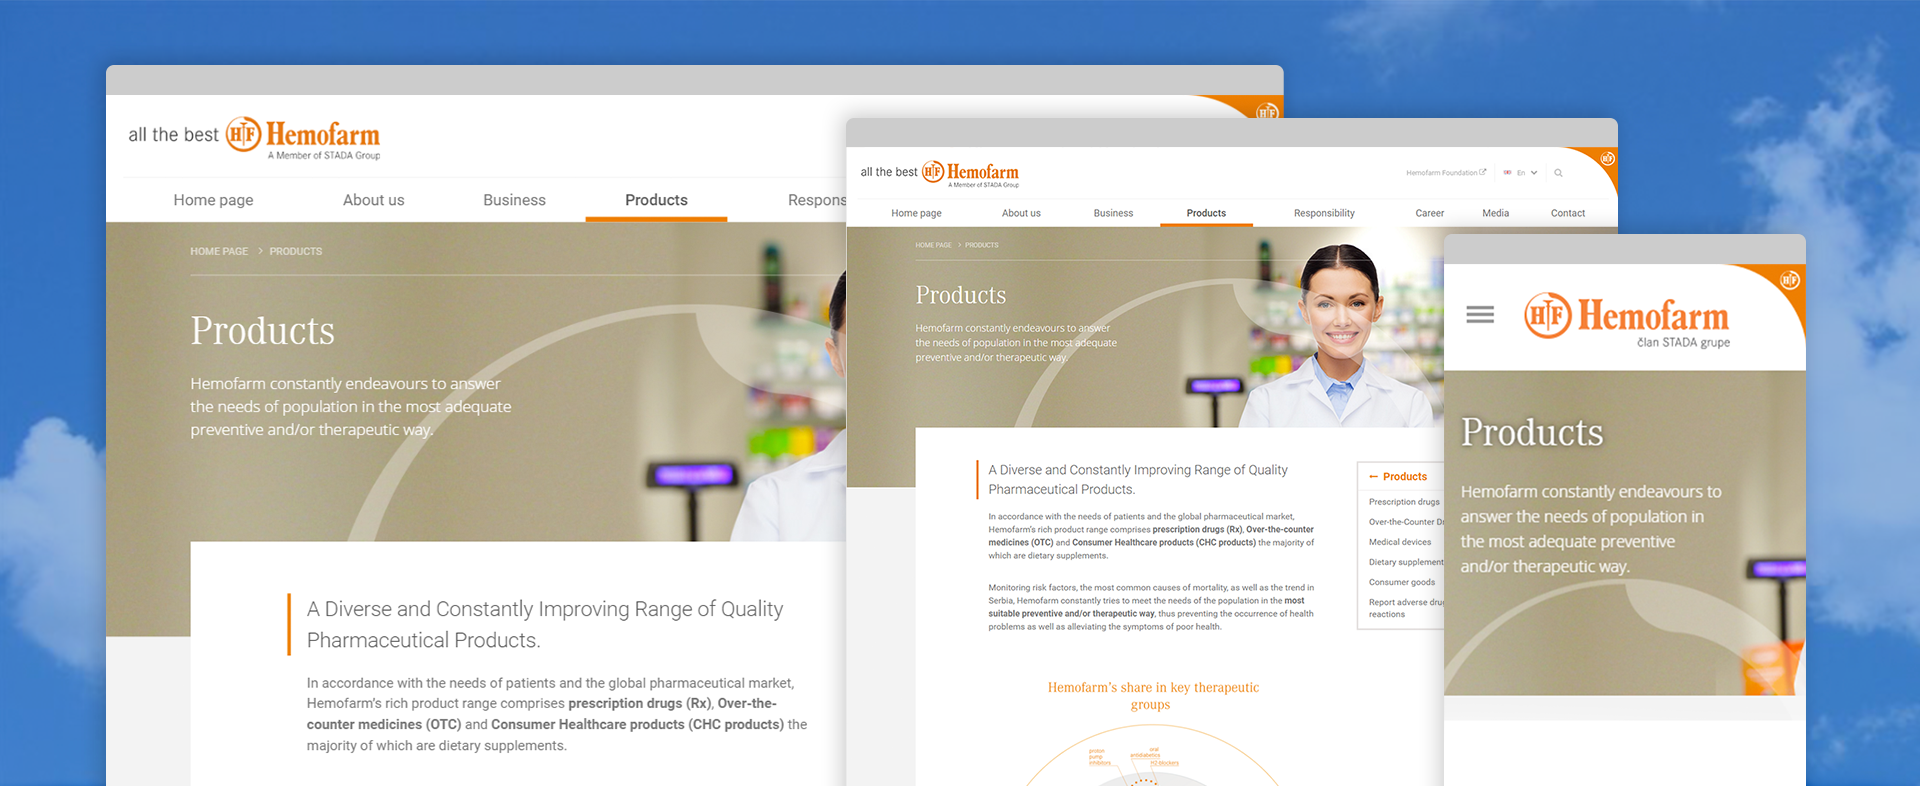 Hemofarm portal preview